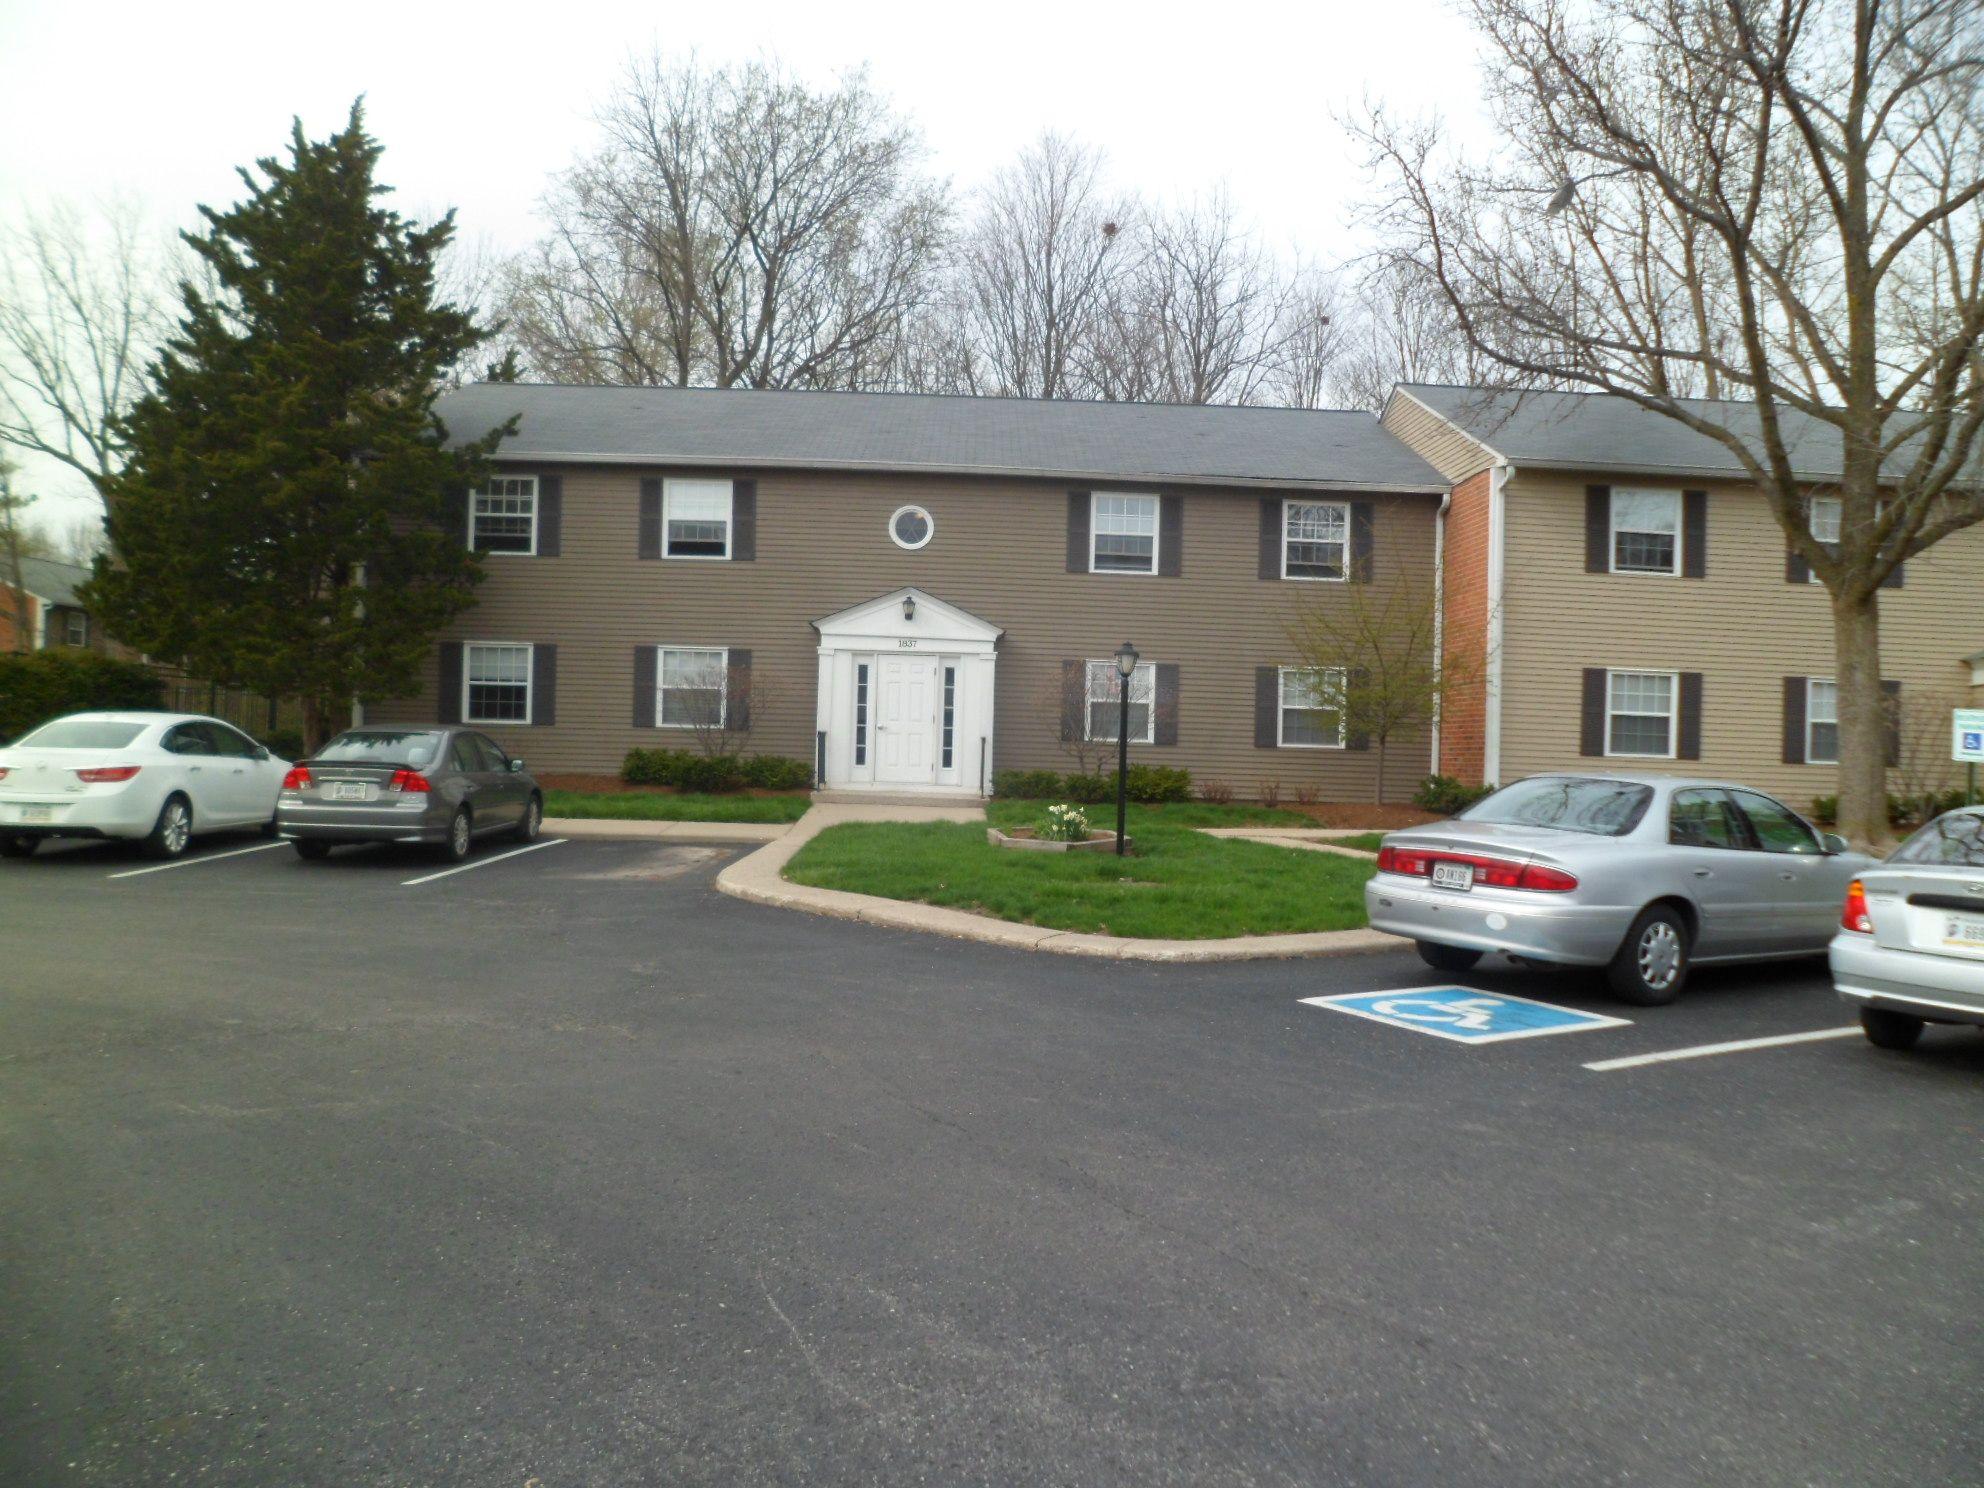 Apartment Complex In Indianapolis Indiana Apartment Complexes Apartment Home